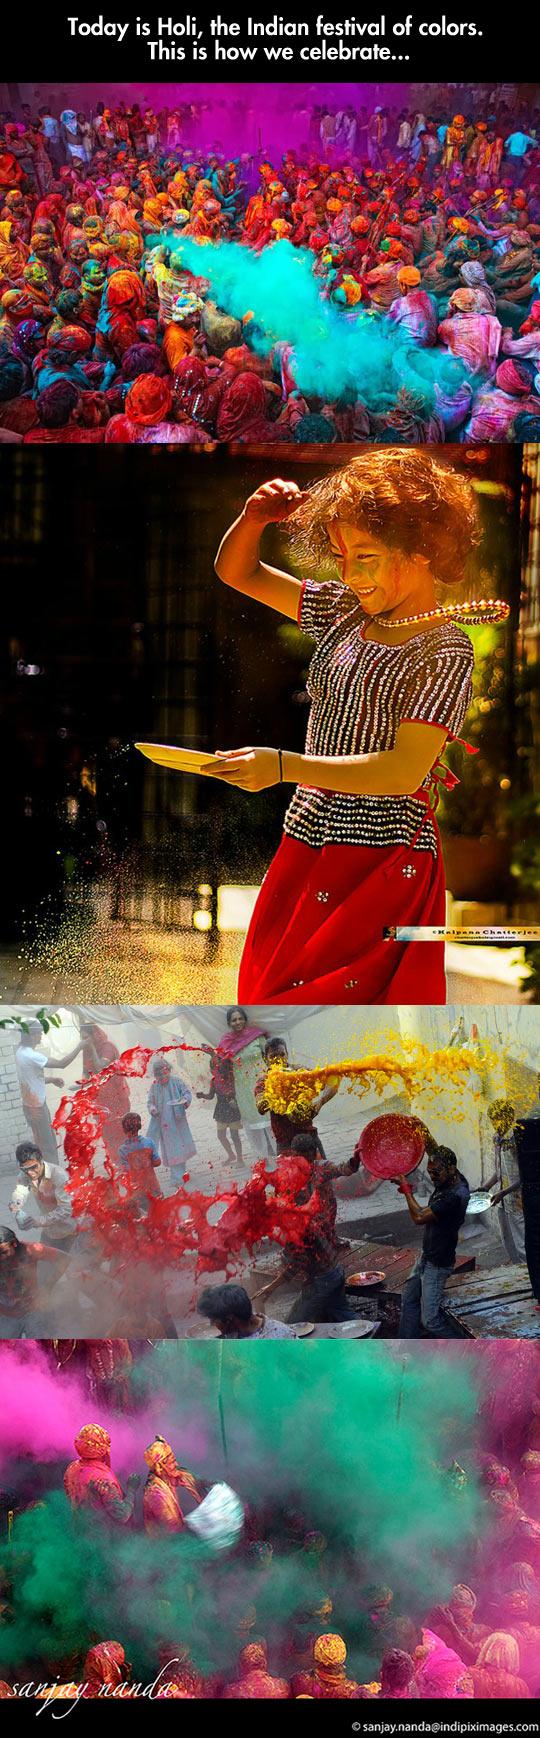 cool-Holi-Indian-celebration-festival-colors